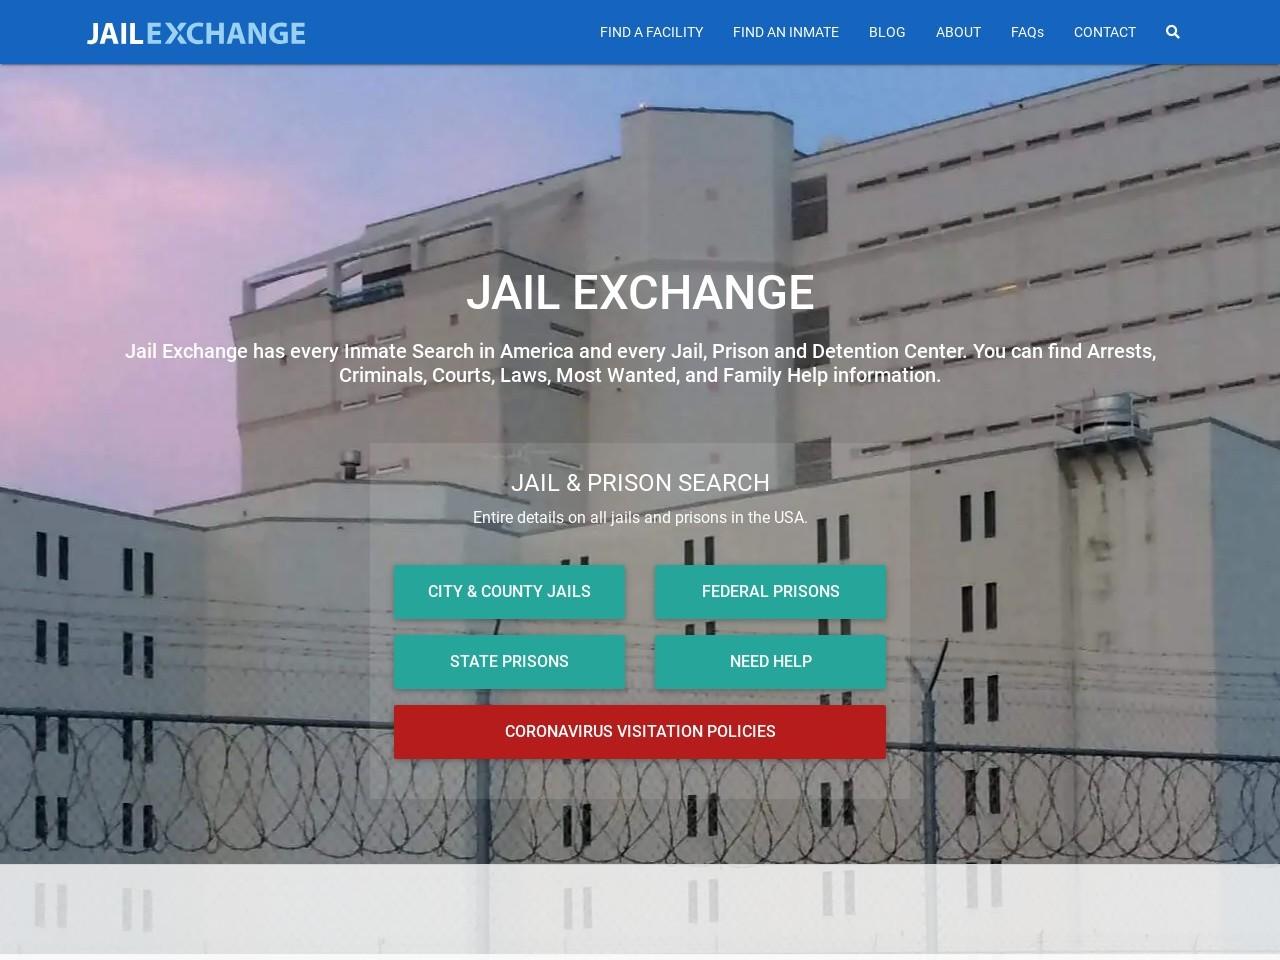 jailexchange.com